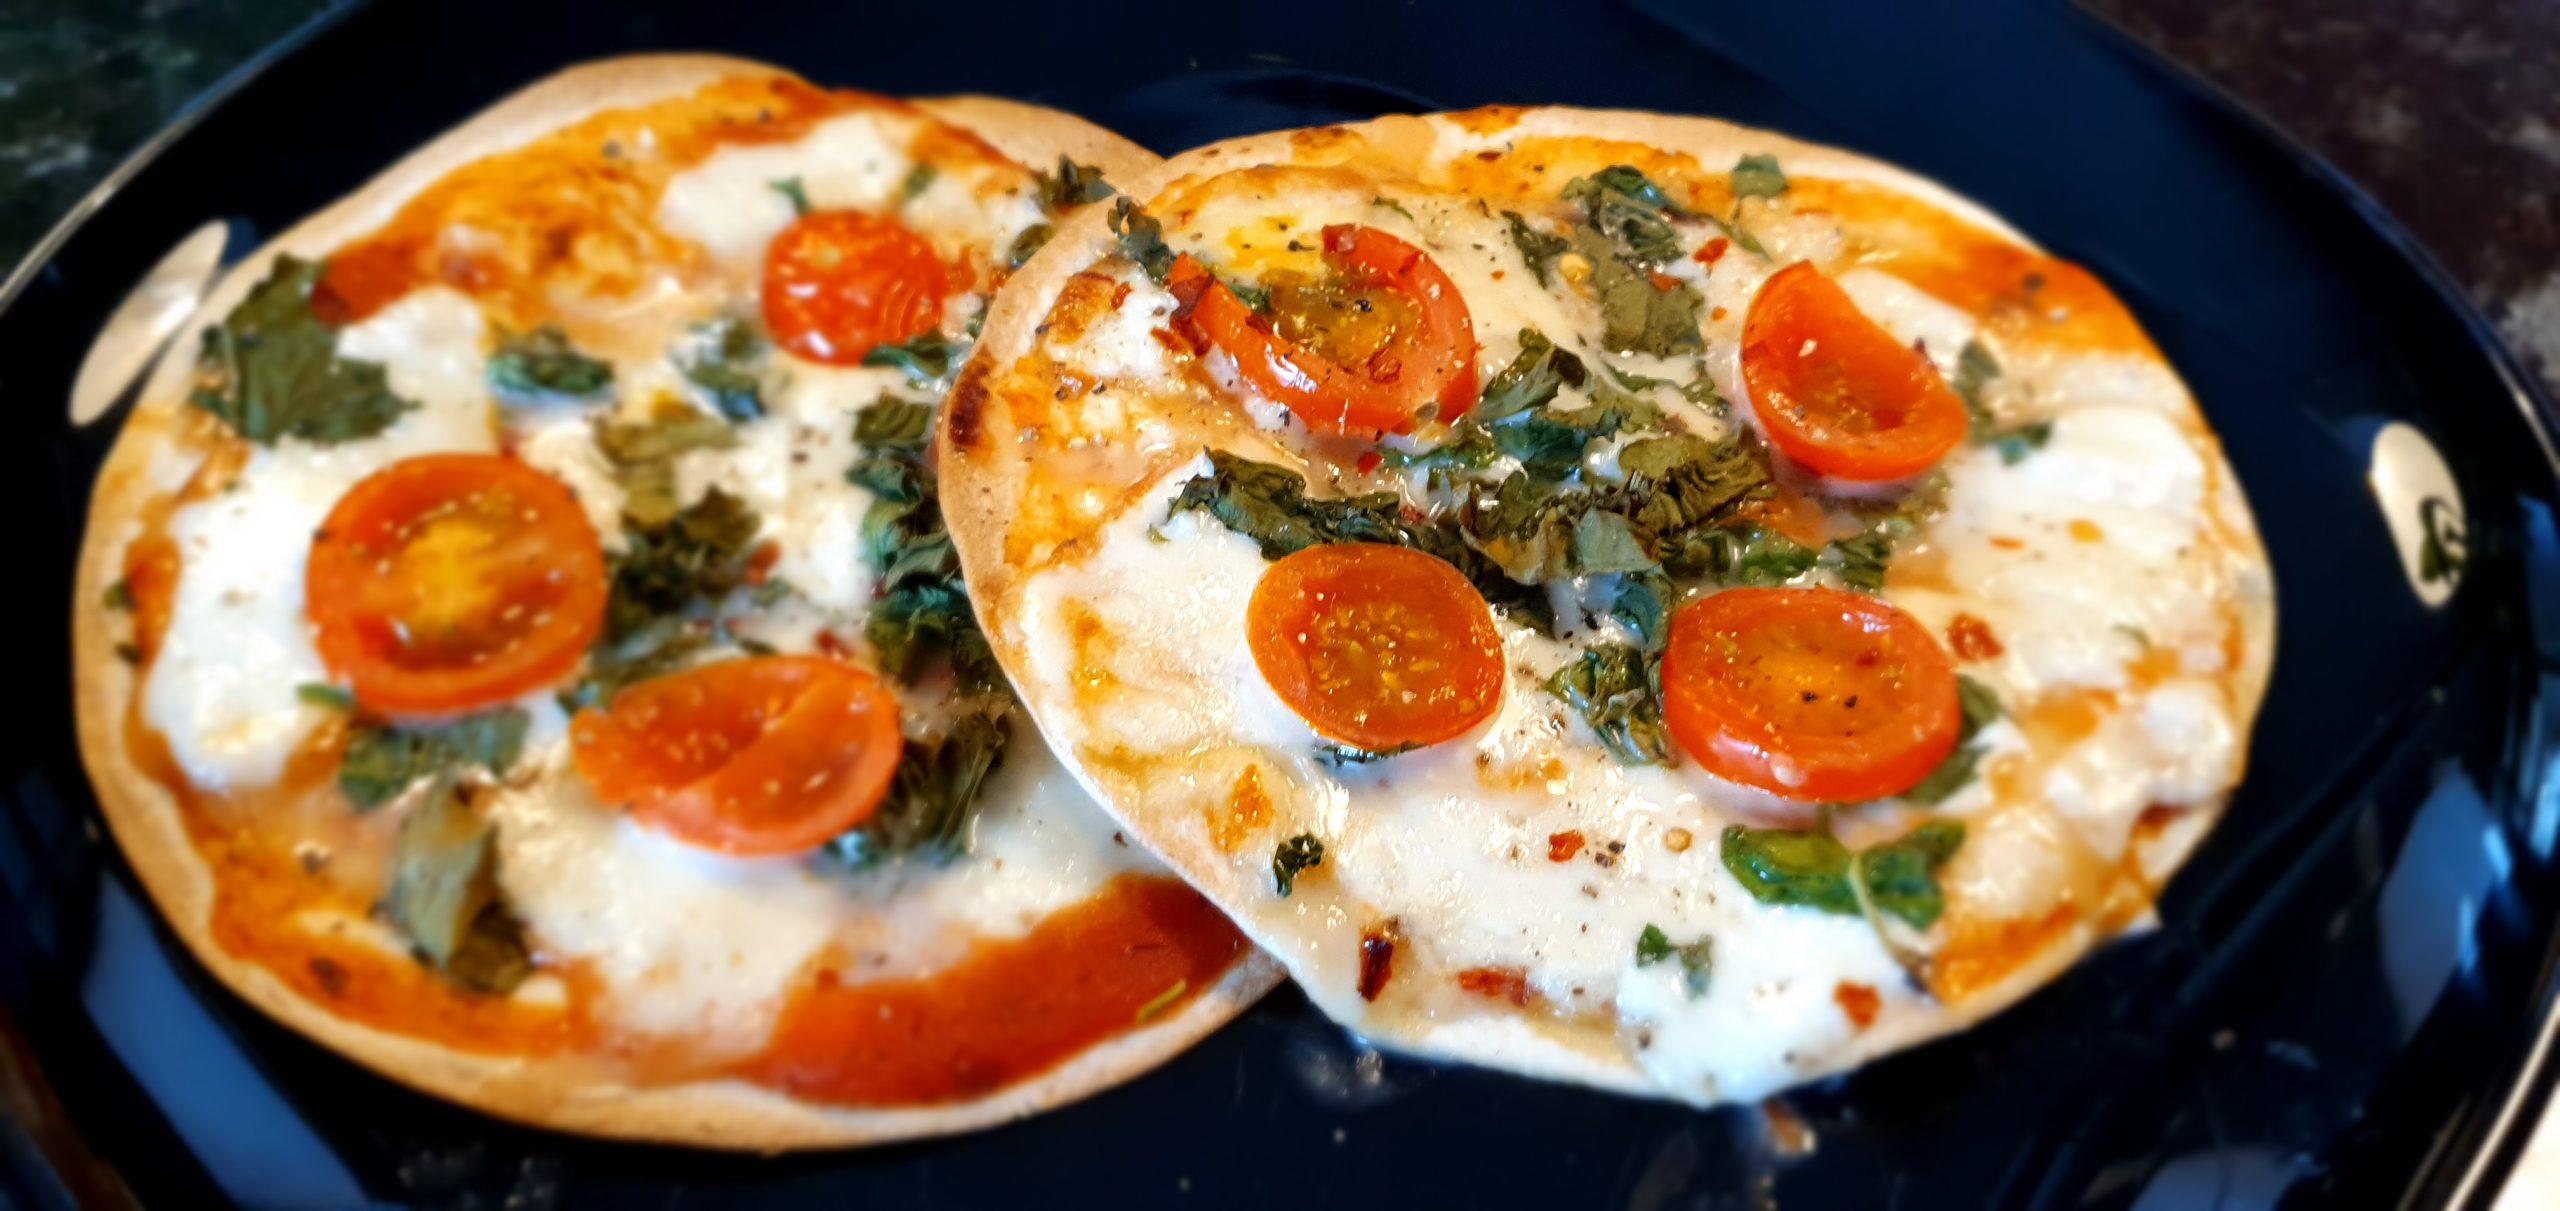 Tortillapizza med mozzarella